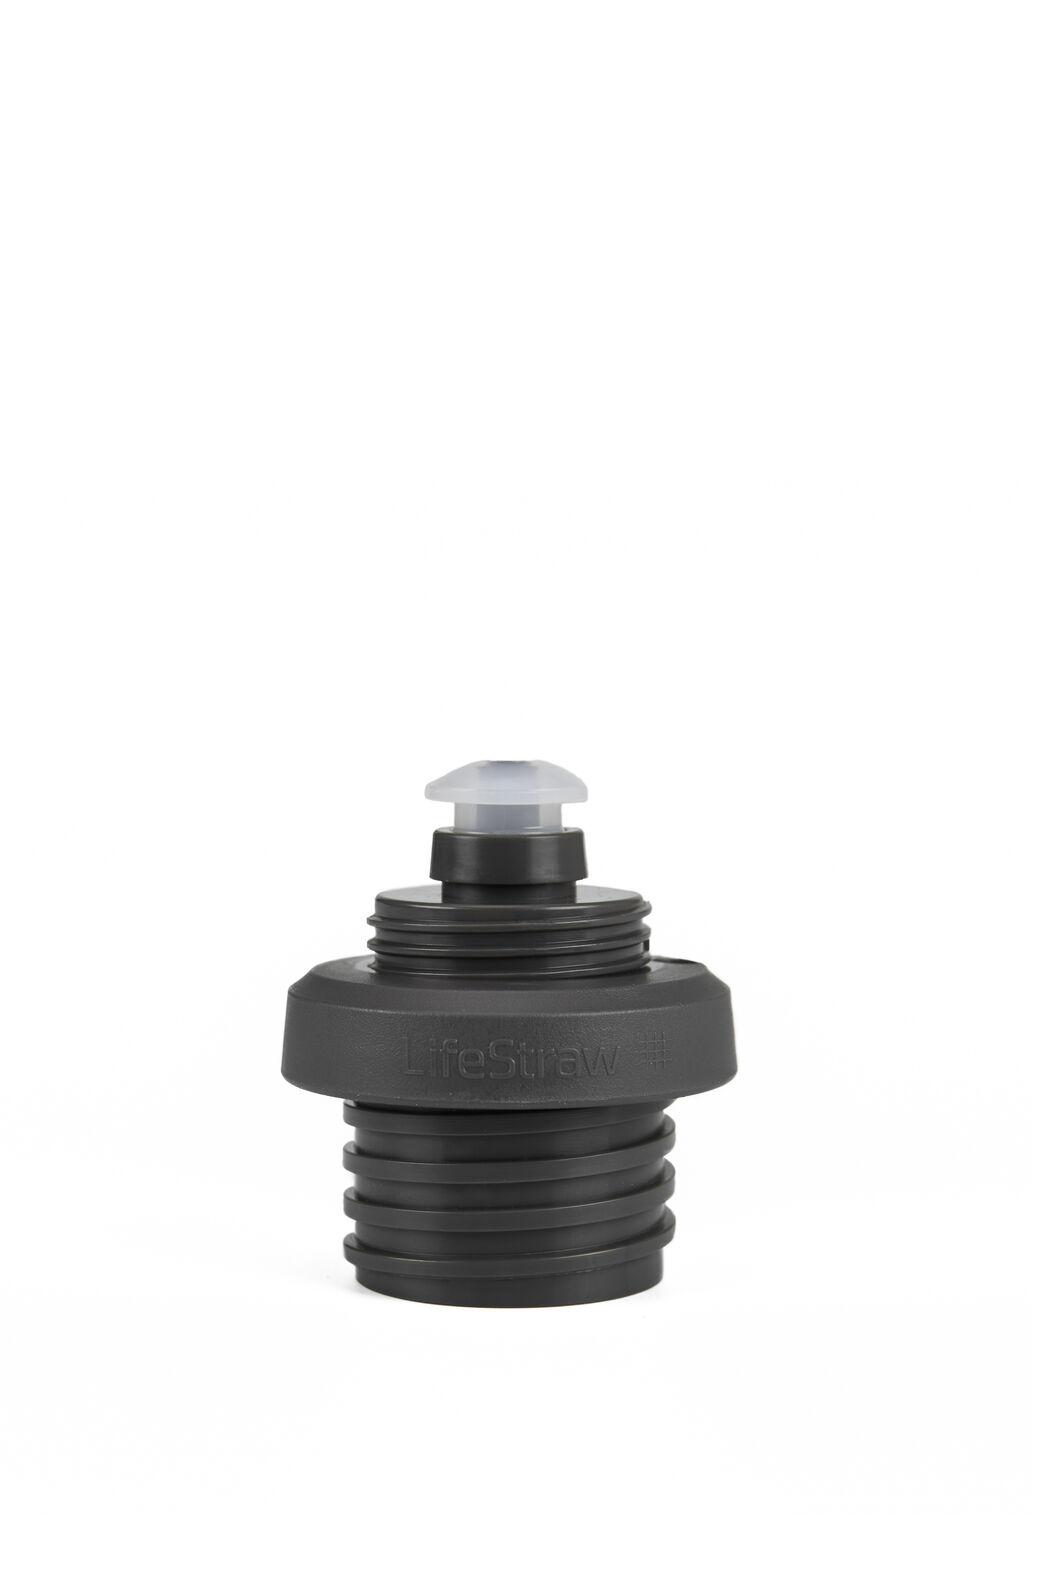 LifeStraw Universal Water Filter, None, hi-res